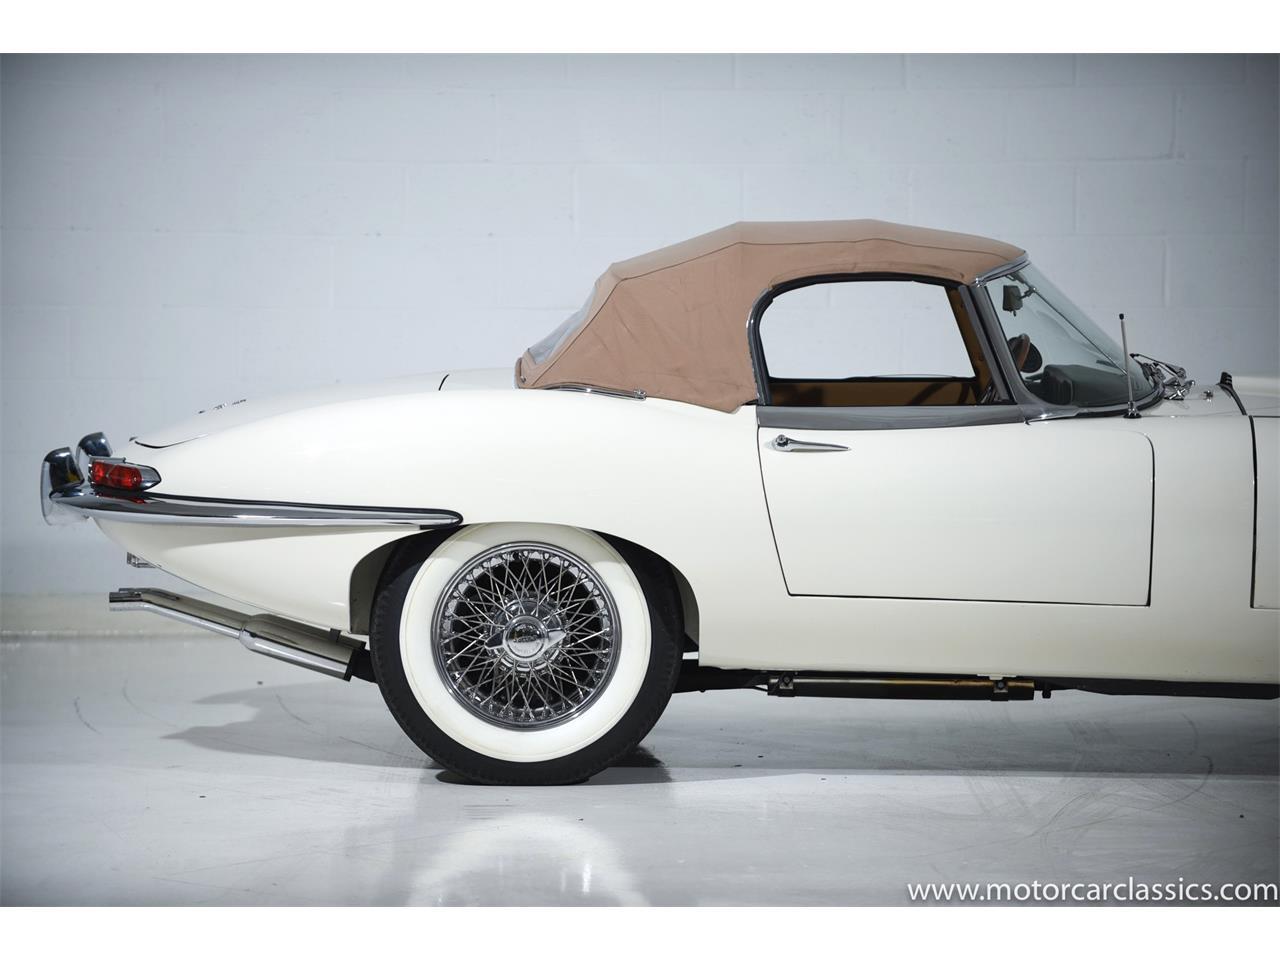 1965 Jaguar E-Type (CC-1182835) for sale in Farmingdale, New York